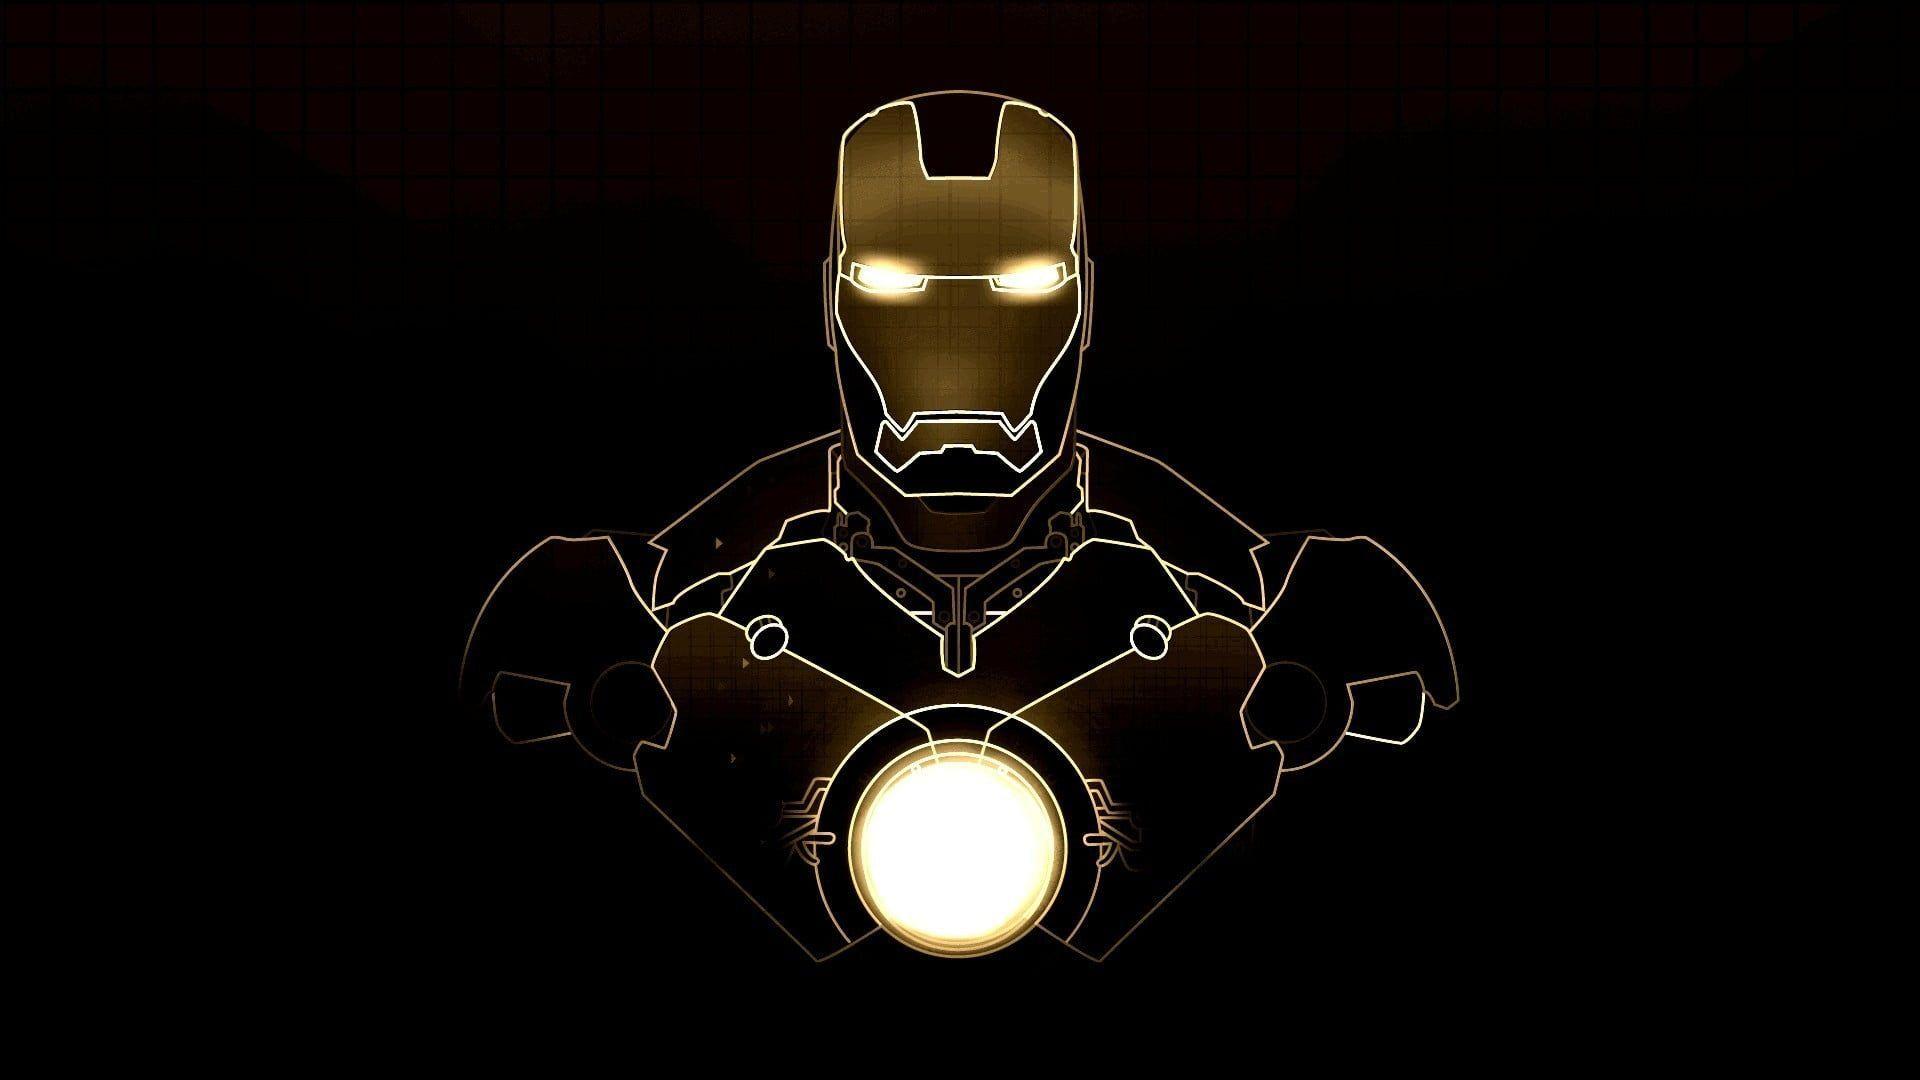 Marvel Iron Man Digital Wallpaper Iron Man 1080p Wallpaper Hdwallpaper Deskt 1080p Deskt Digita In 2020 Iron Man Wallpaper Iron Man Hd Wallpaper Man Wallpaper